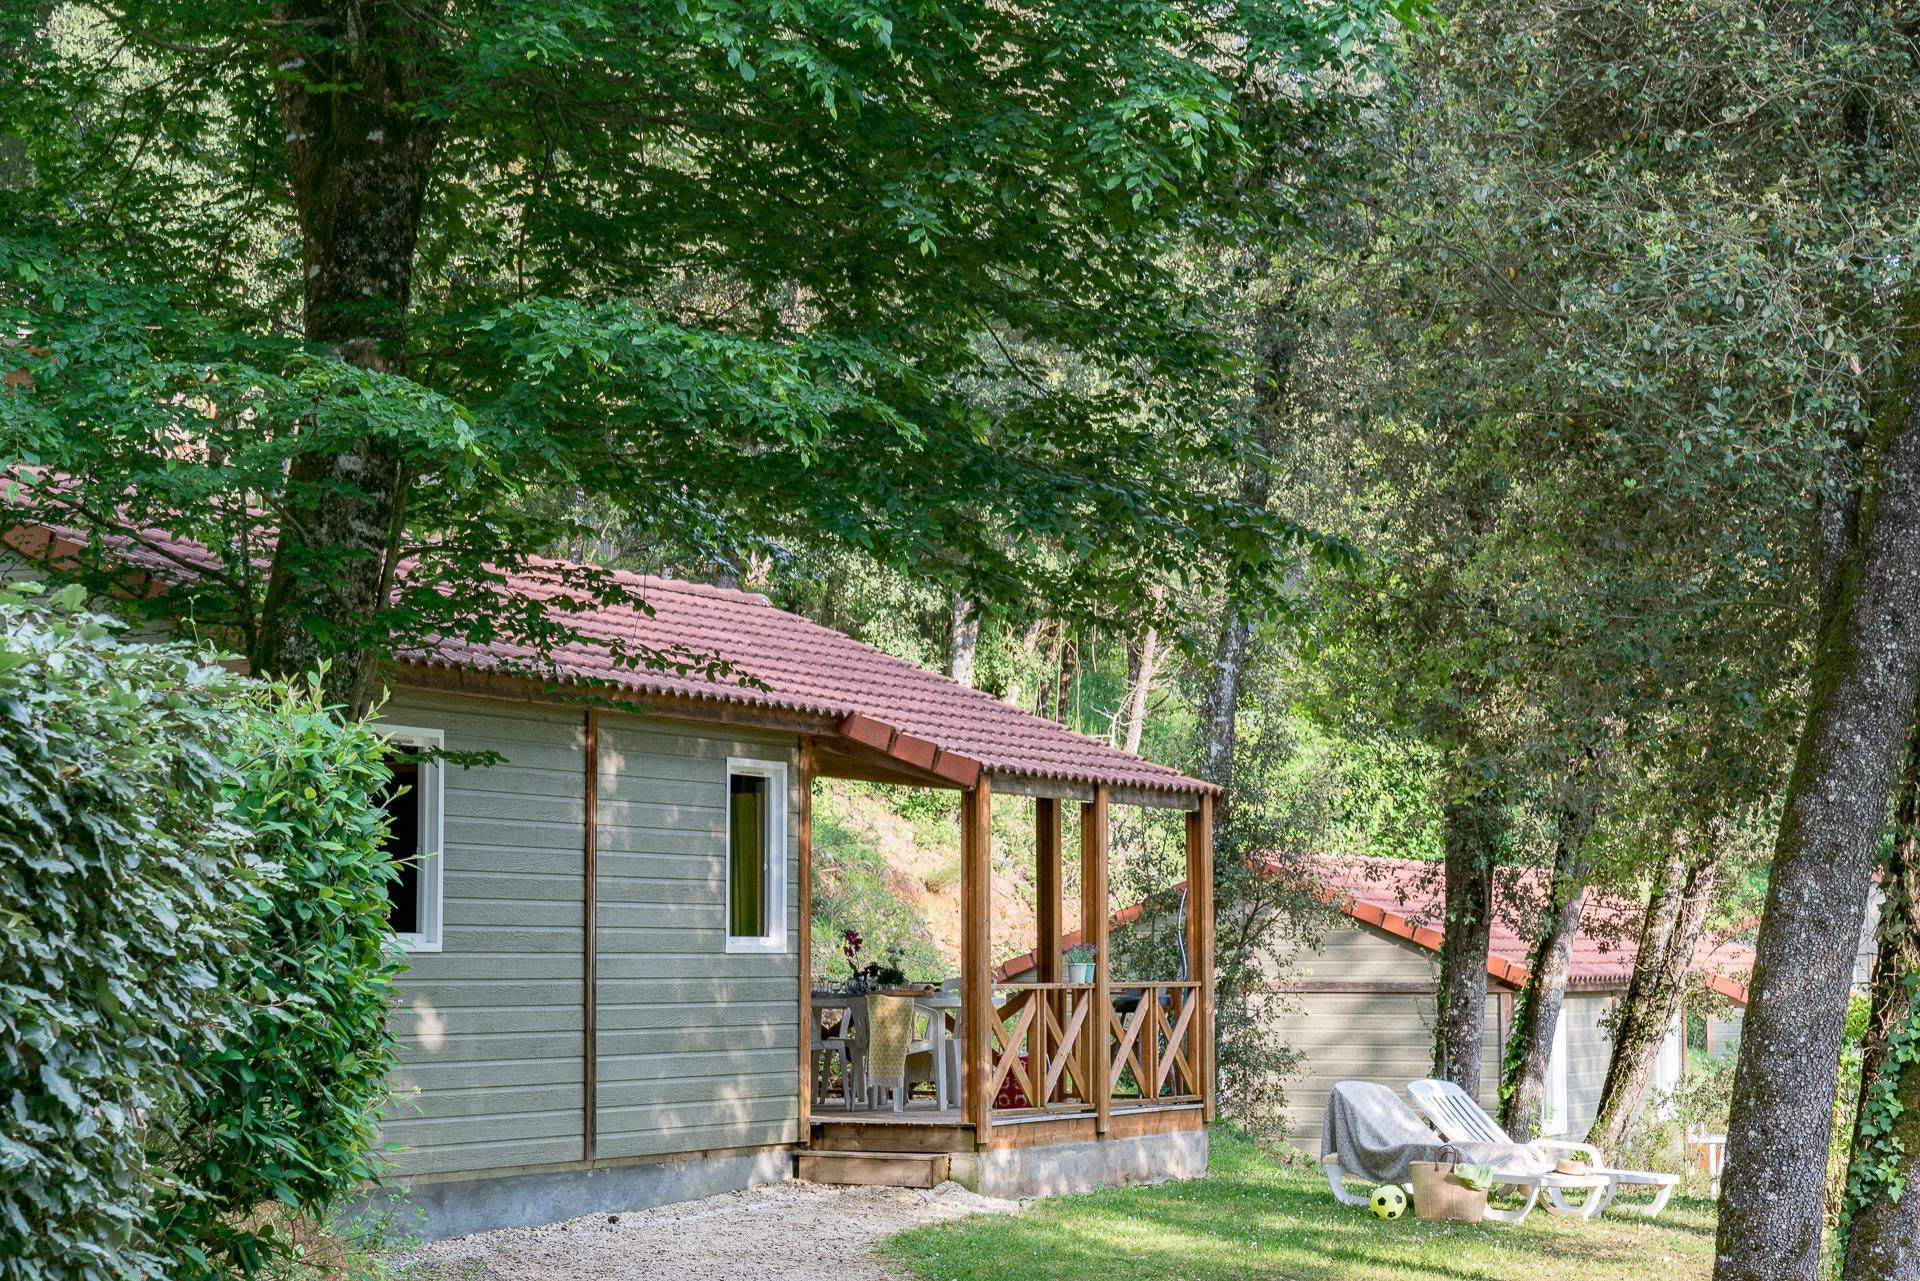 Location - Chalet 3 Chambres Clim **** - Camping Sandaya Les Péneyrals